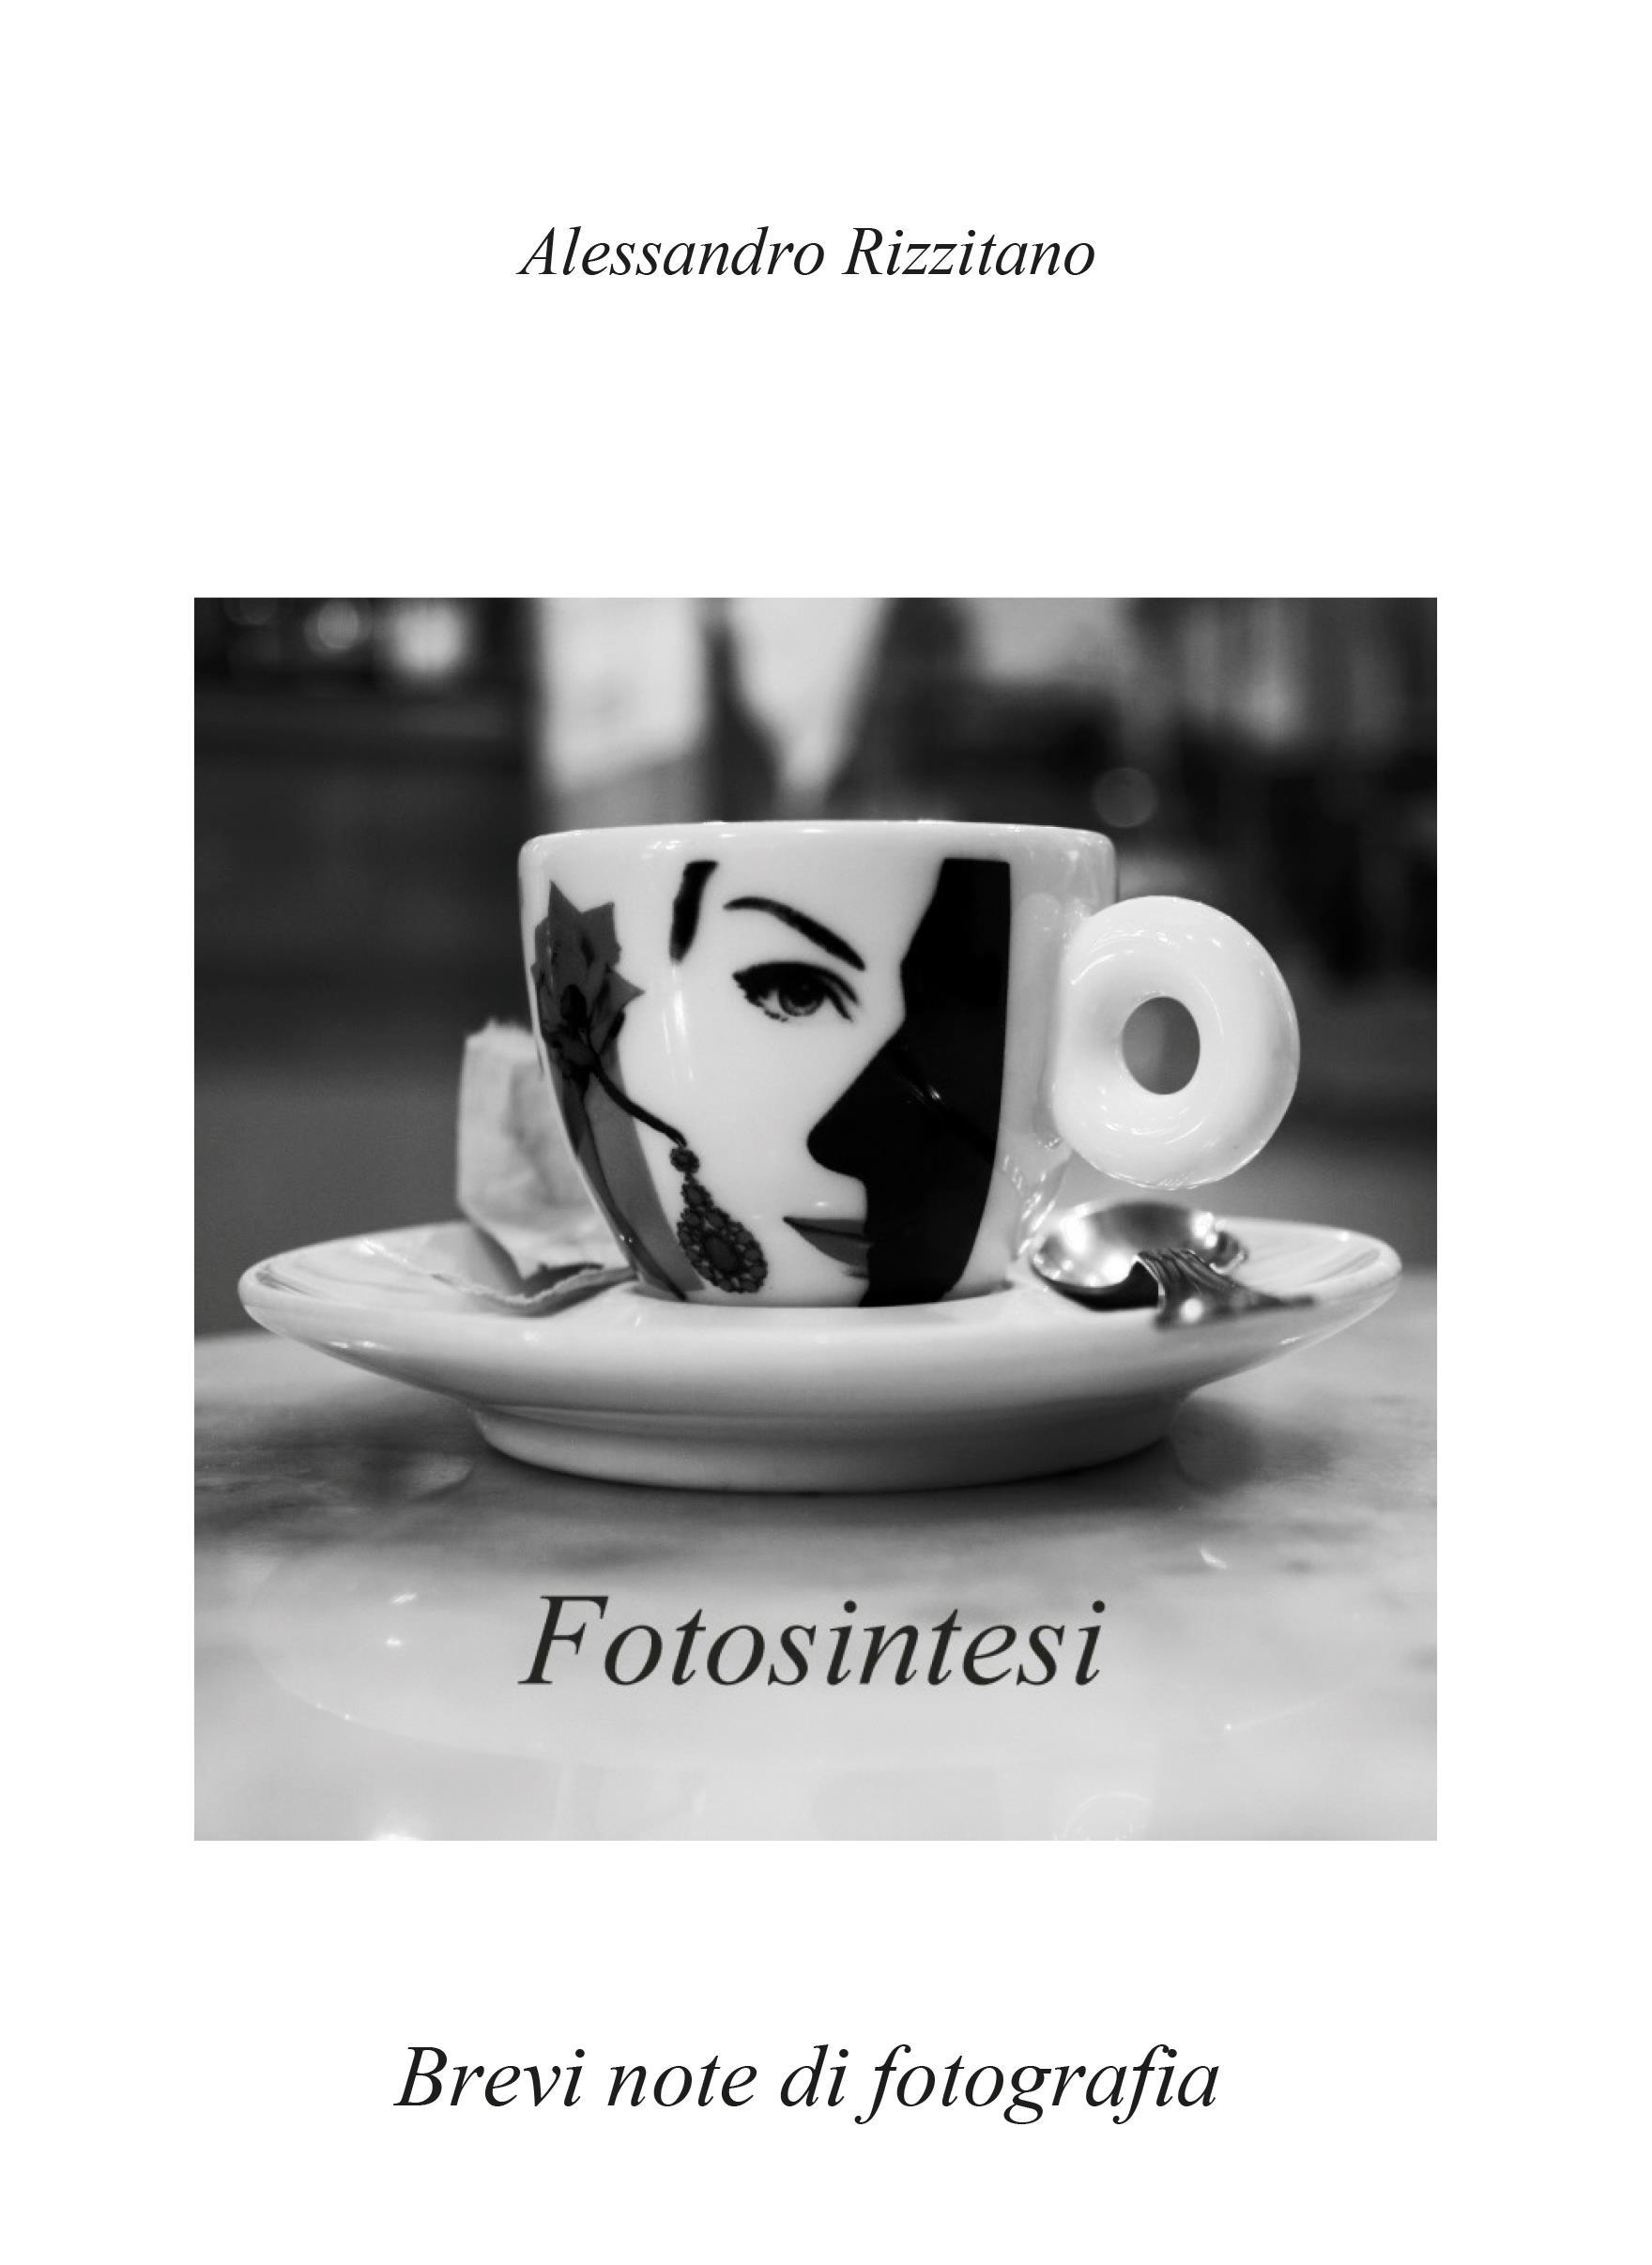 FOTOSINTESI - Brevi note di fotografia